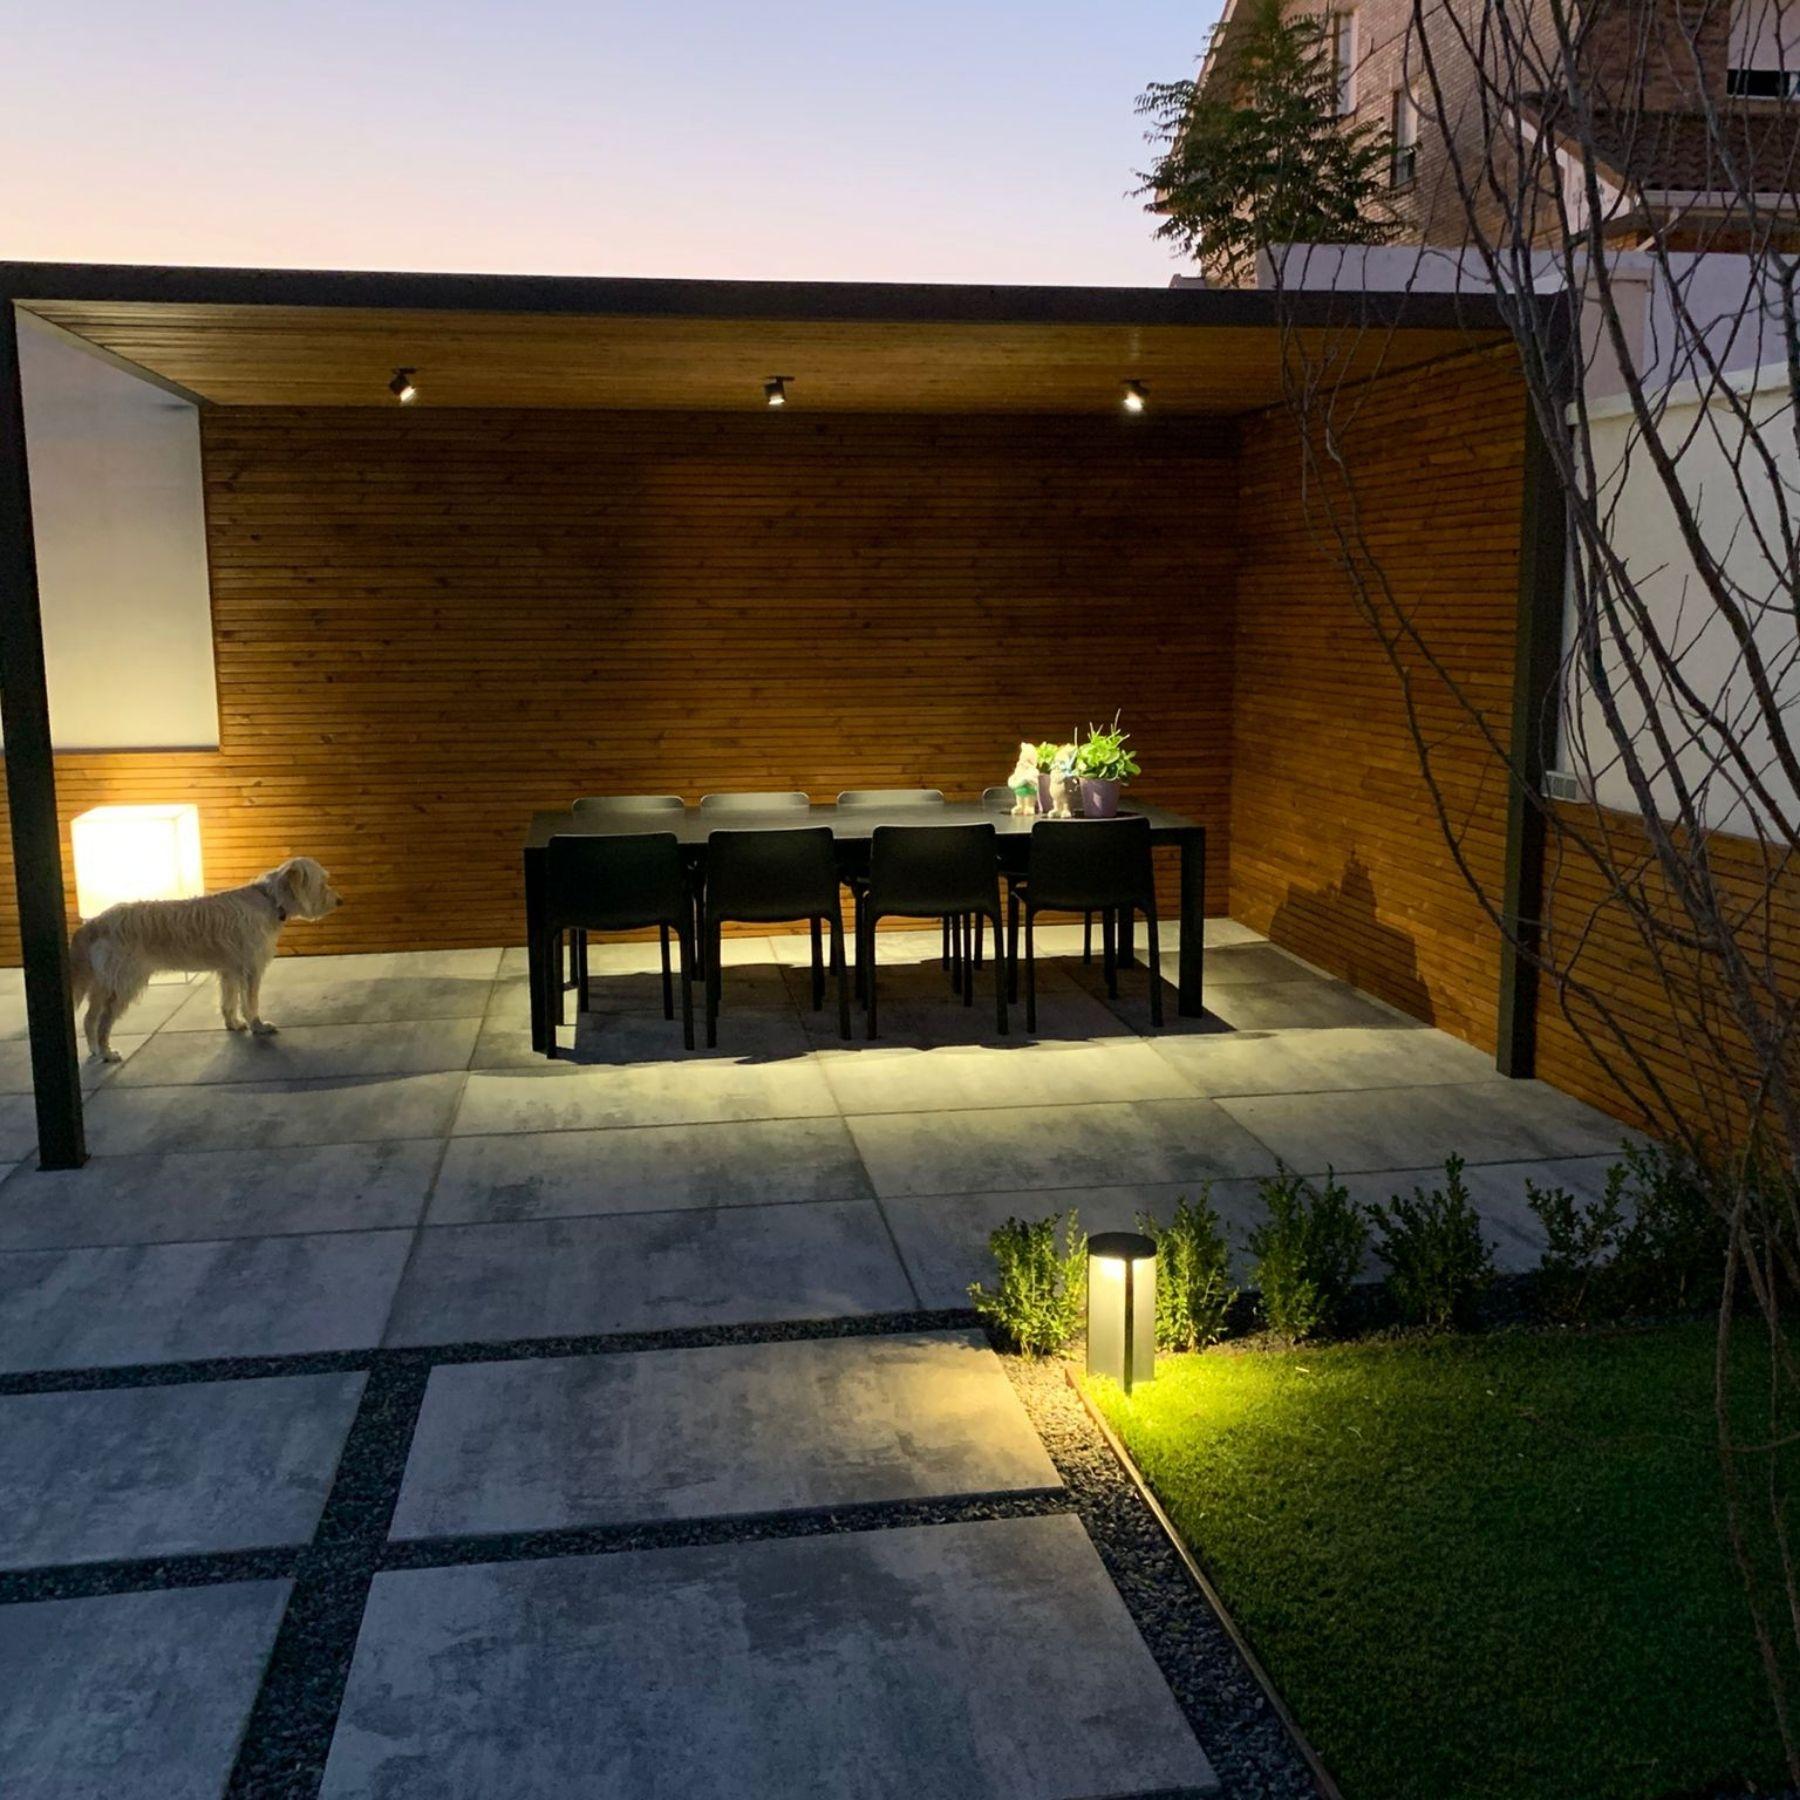 iluminación pérgola cerramiento jardín exterior